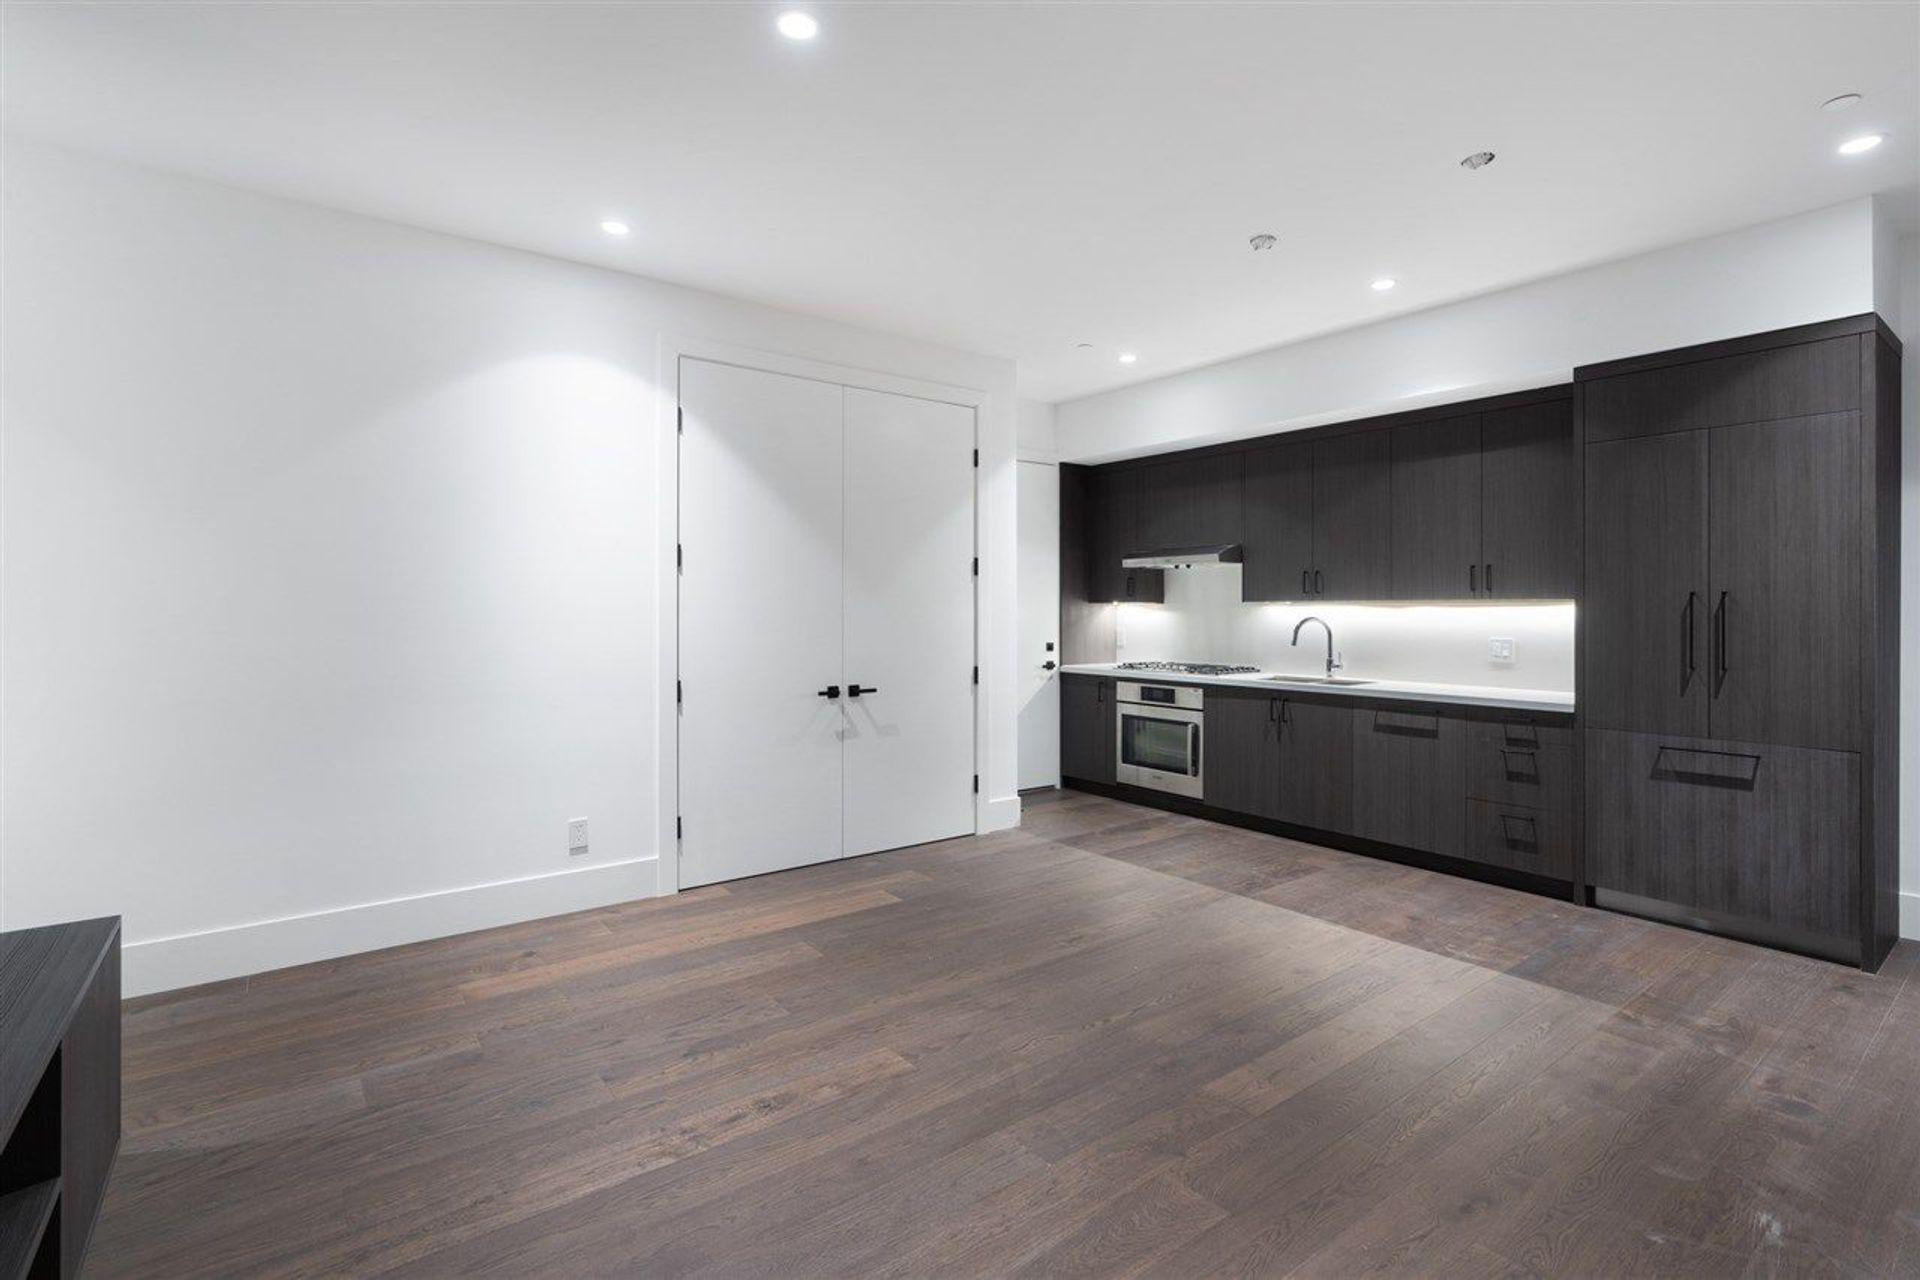 1040-wildwood-lane-british-properties-west-vancouver-25 at 1040 Wildwood Lane, British Properties, West Vancouver